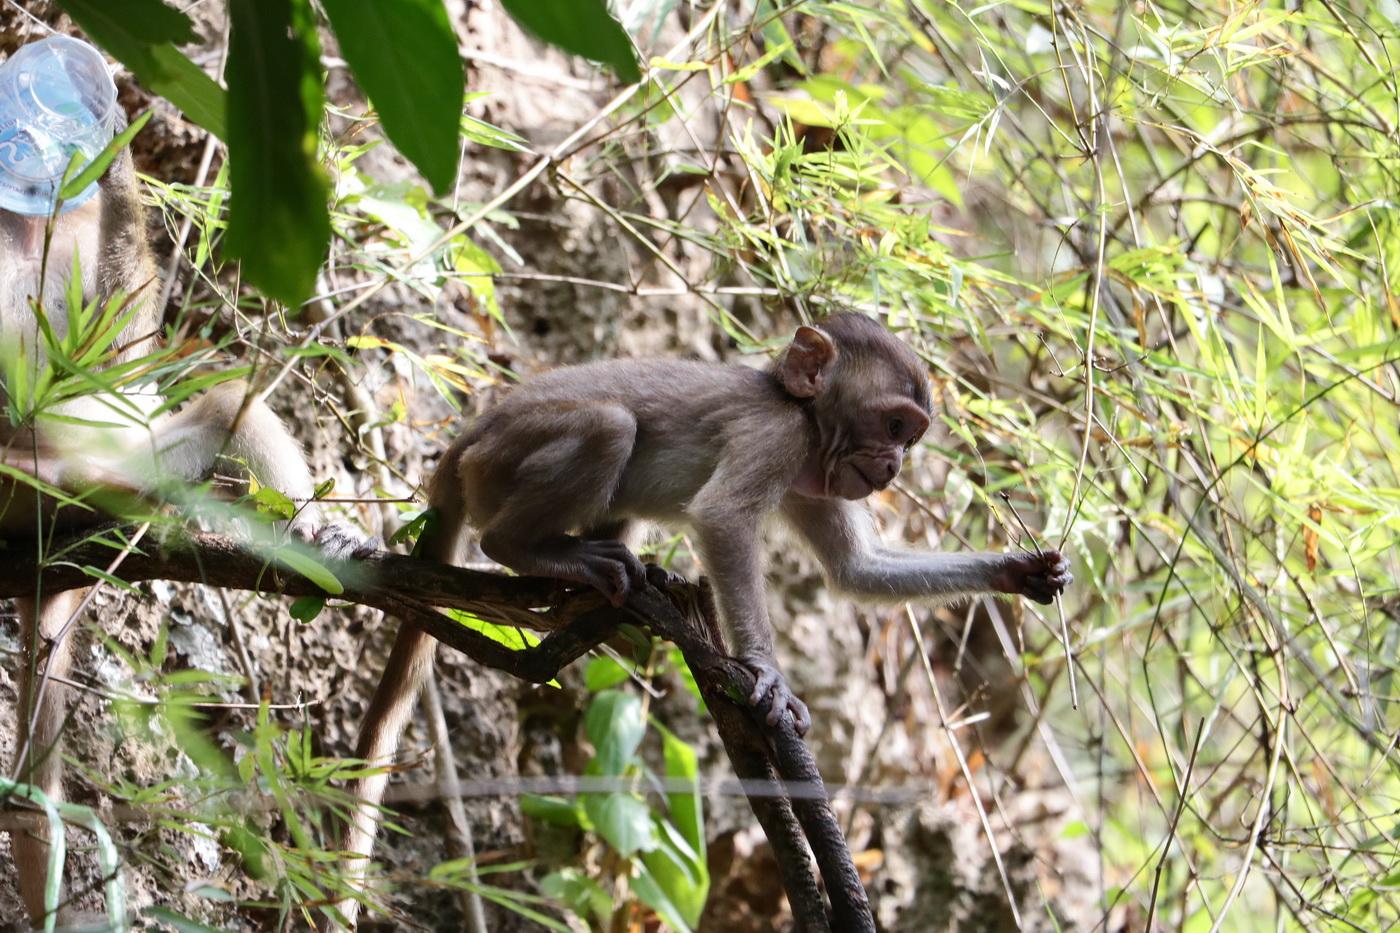 Wild monkey on the way to the beach